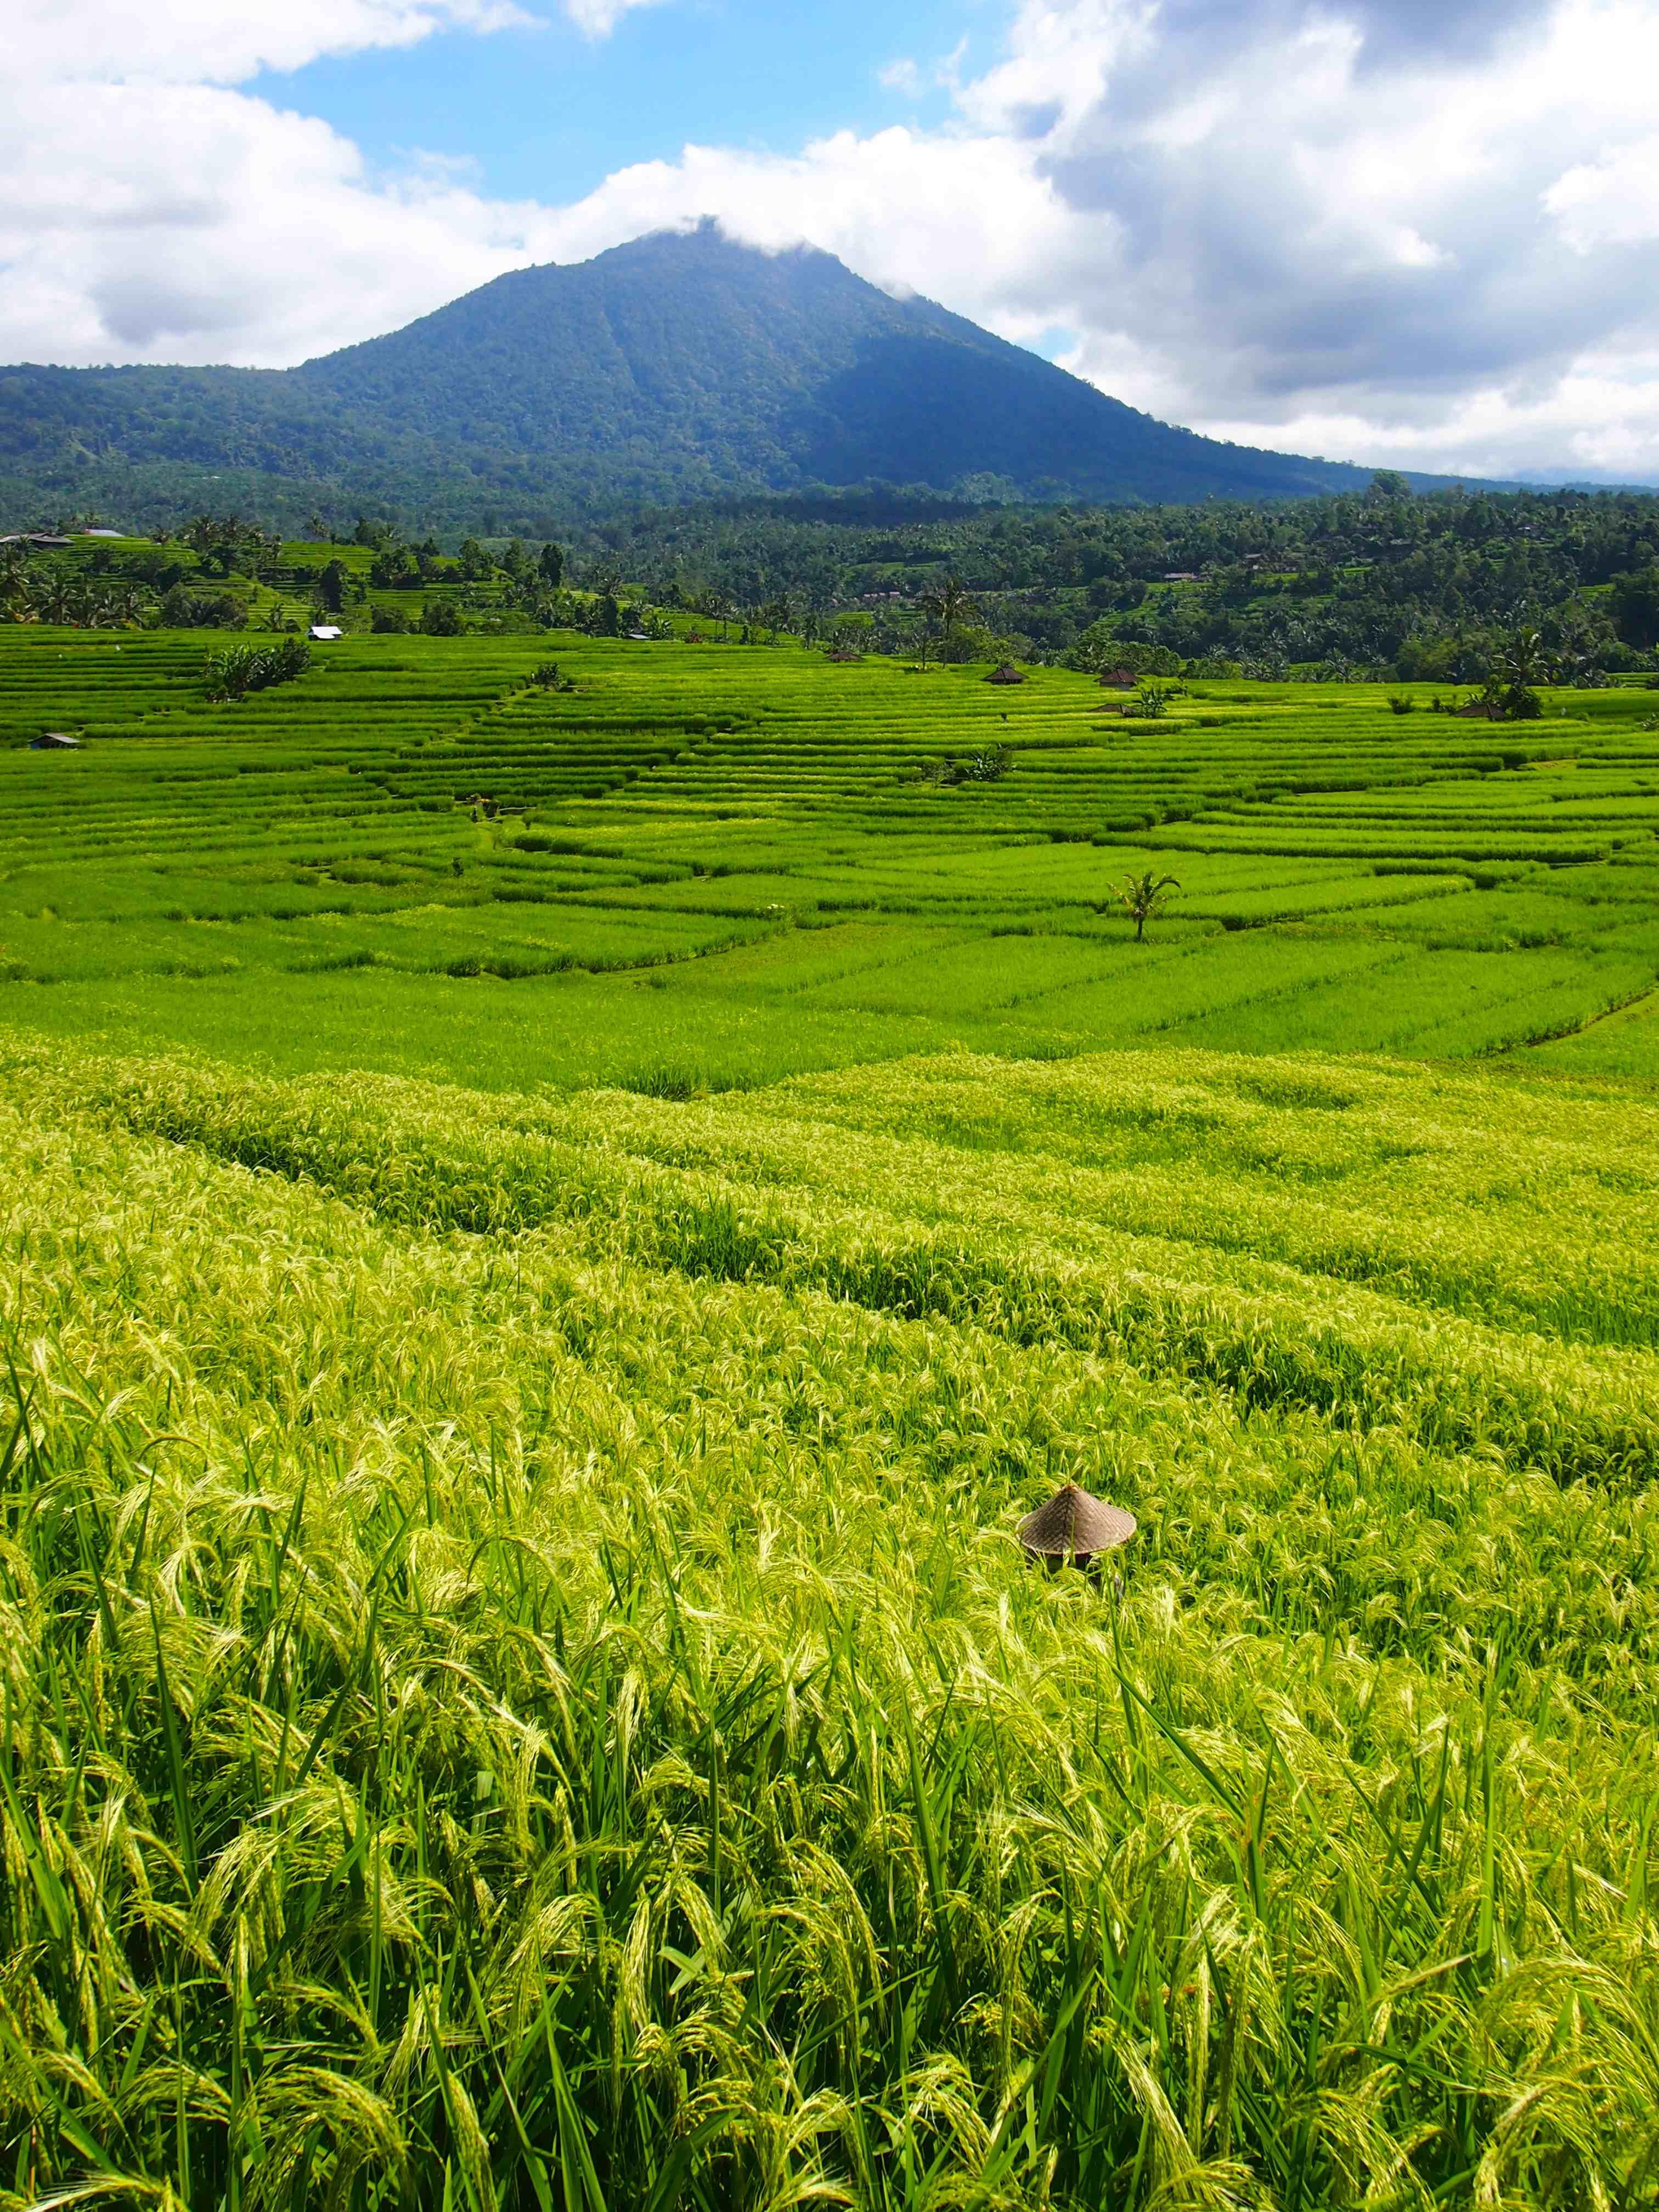 The Rice Fields of Jatiluwih-Bali, Indonesia - Global